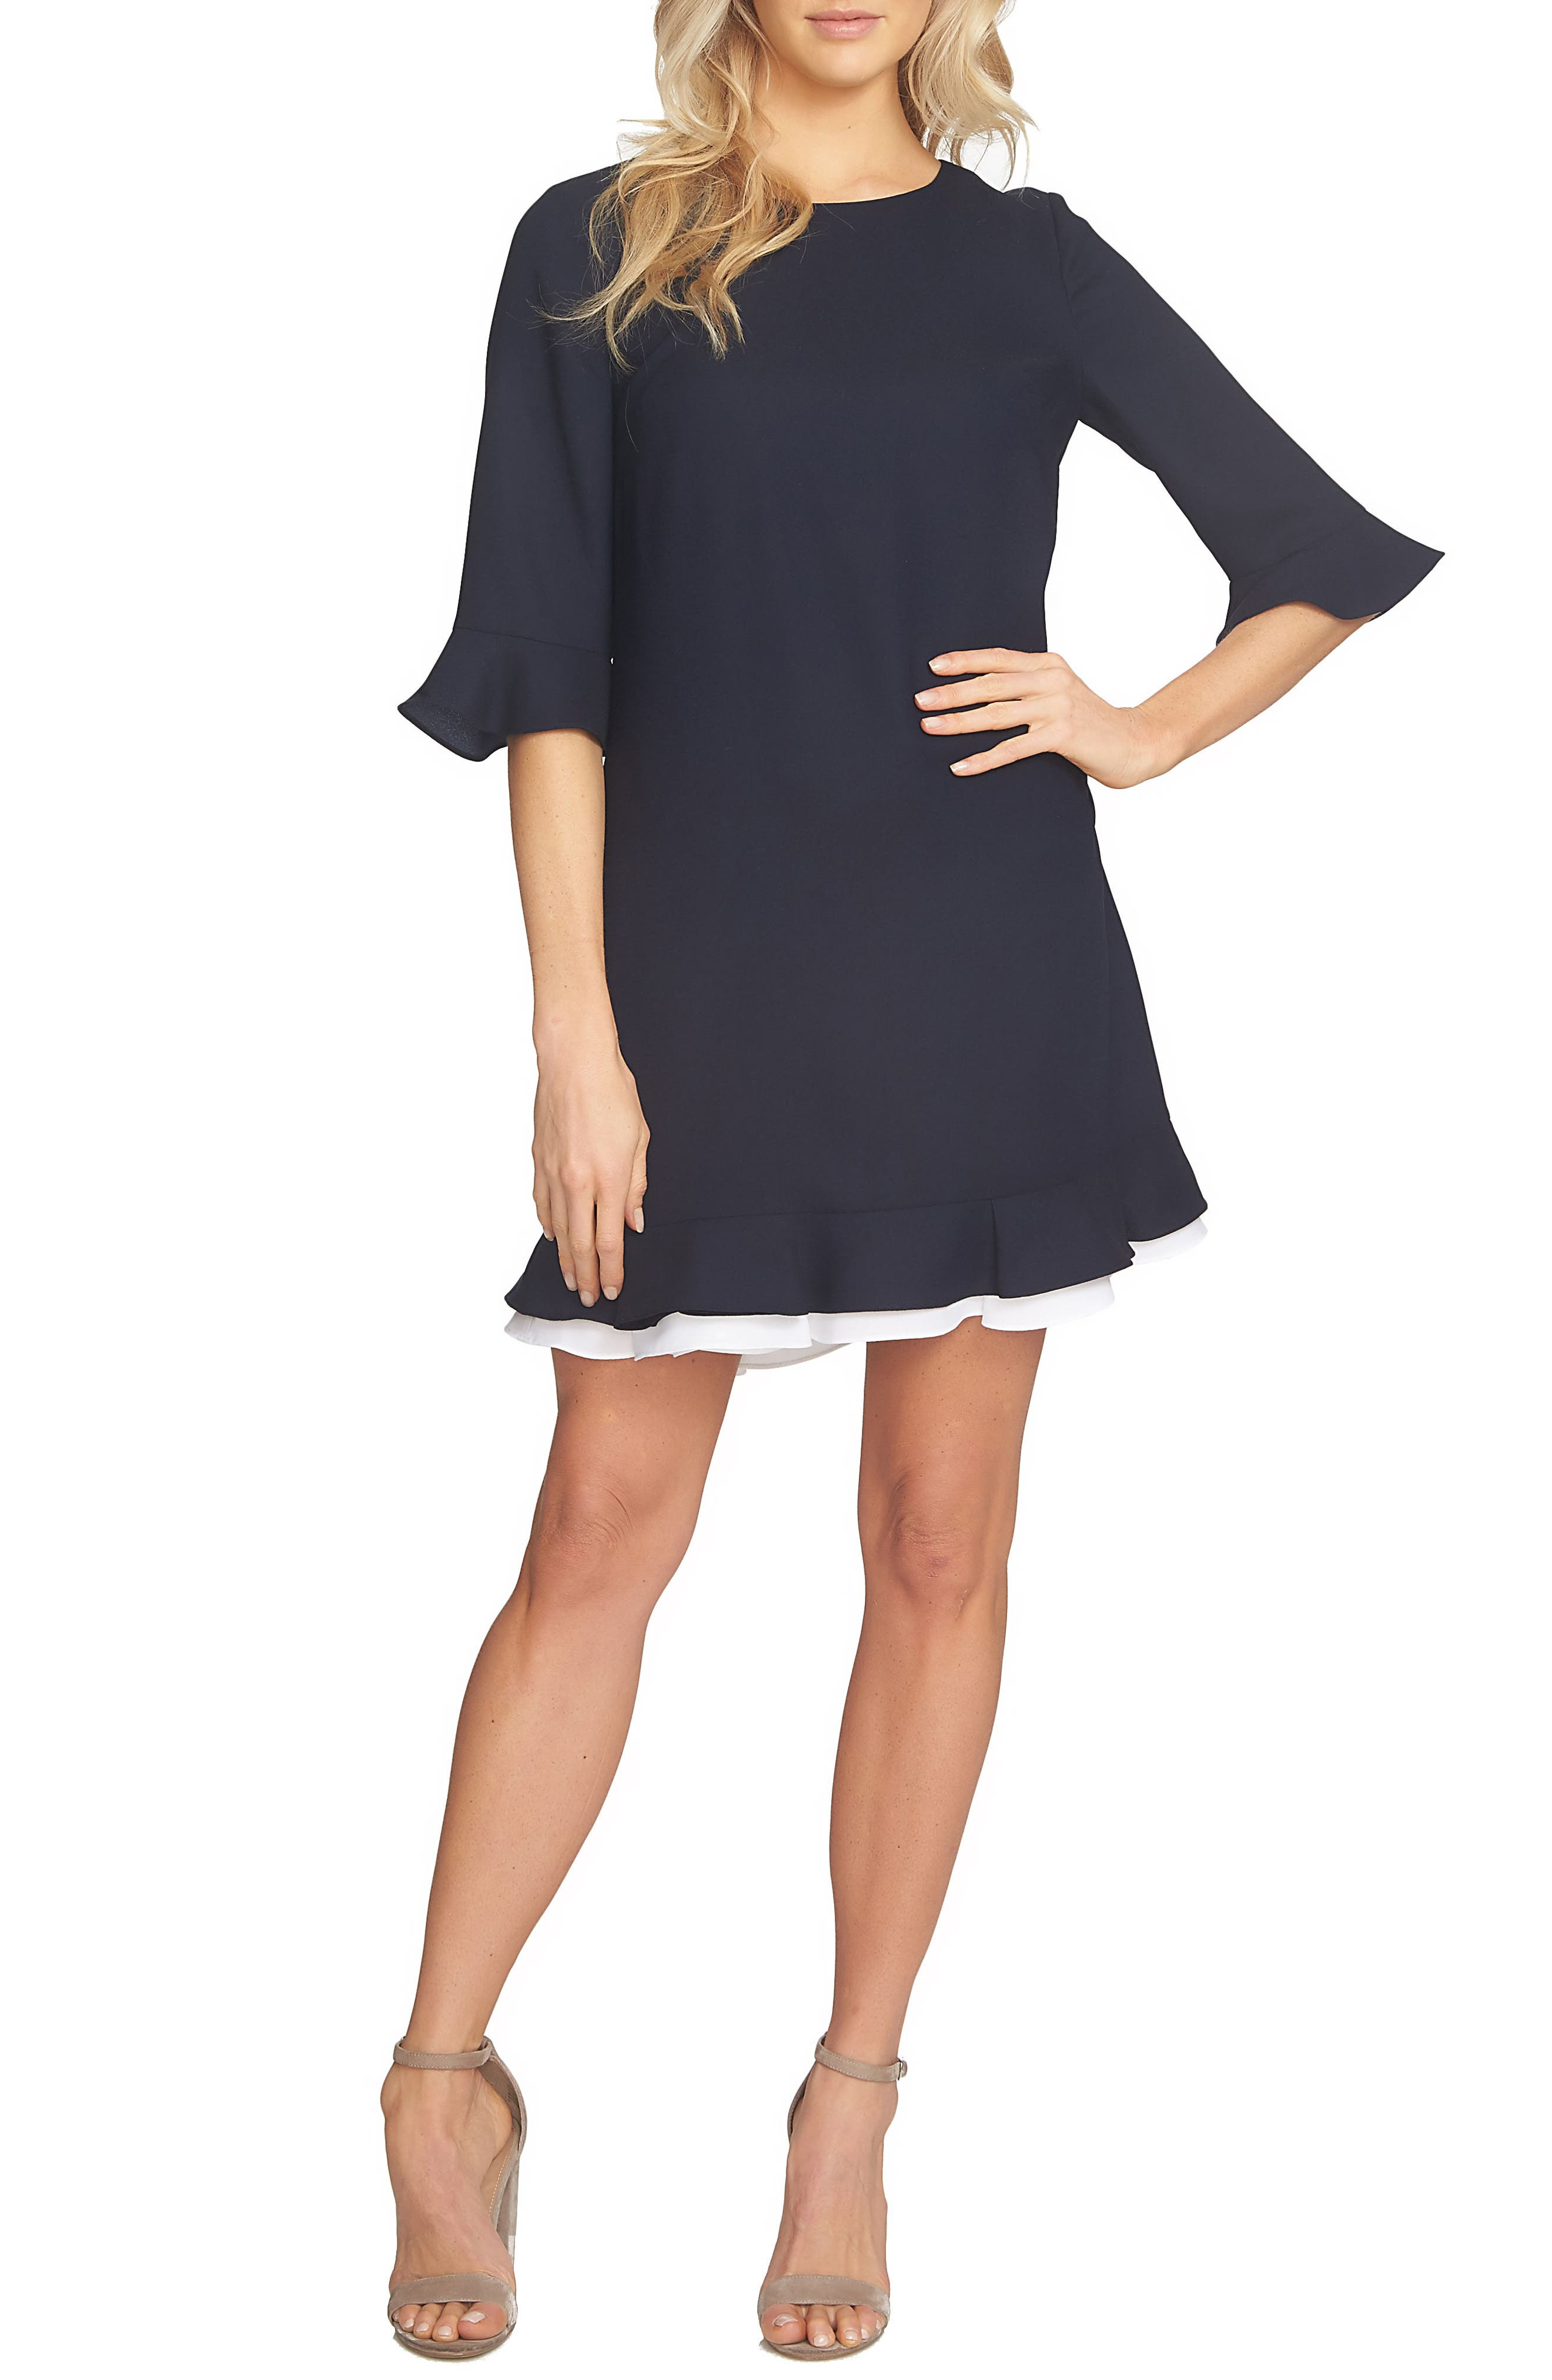 Alternate Image 1 Selected - CeCe Kate Ruffle Dress (Regular & Petite)